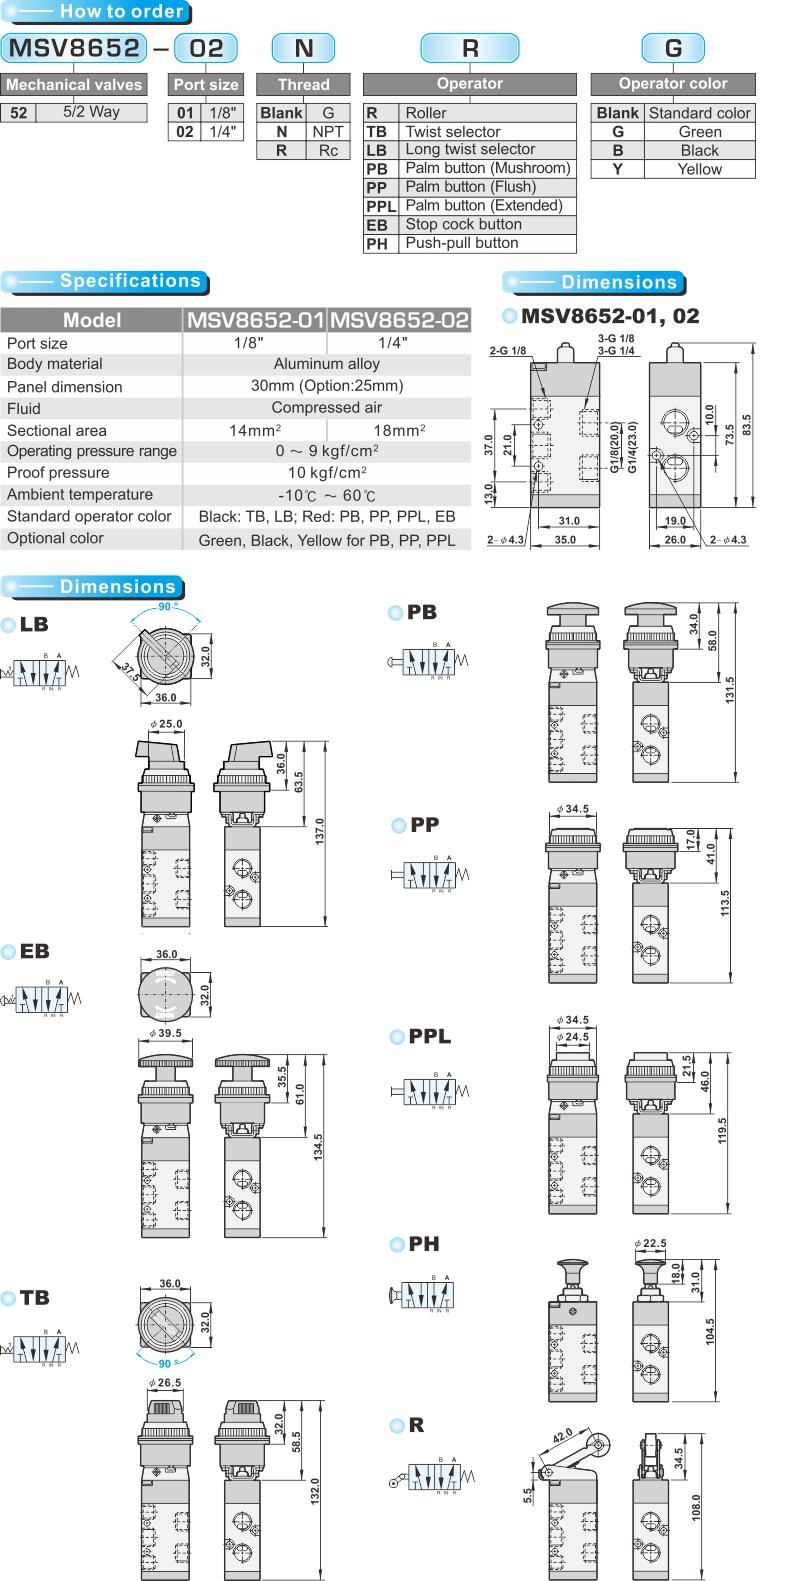 proimages/product_en/MECHANICAL_VALVES/MSV8652.jpg